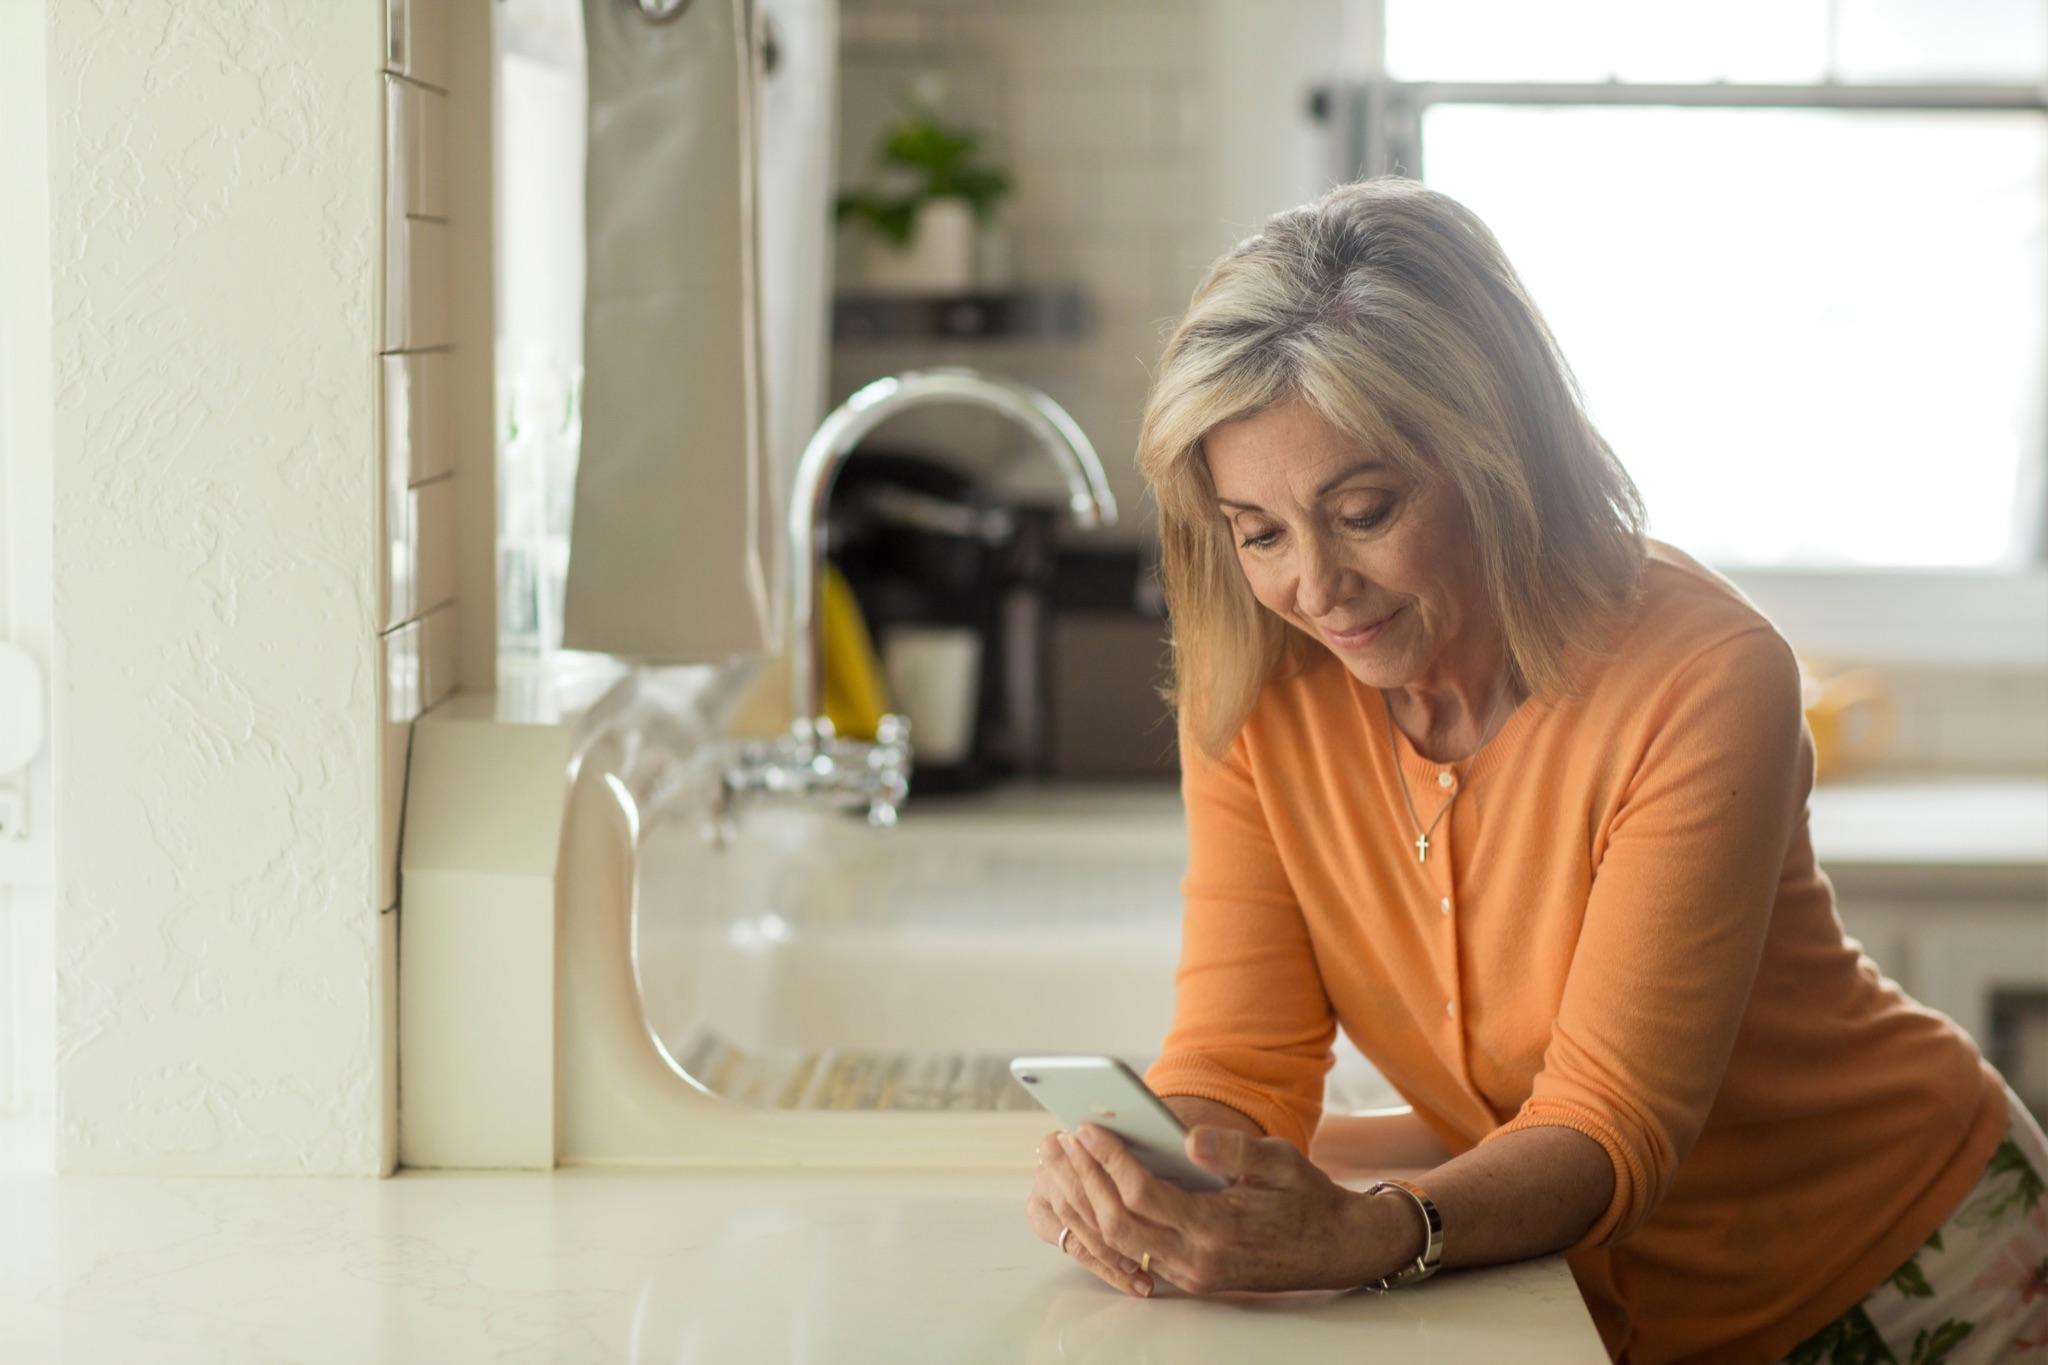 Elderly woman using a phone